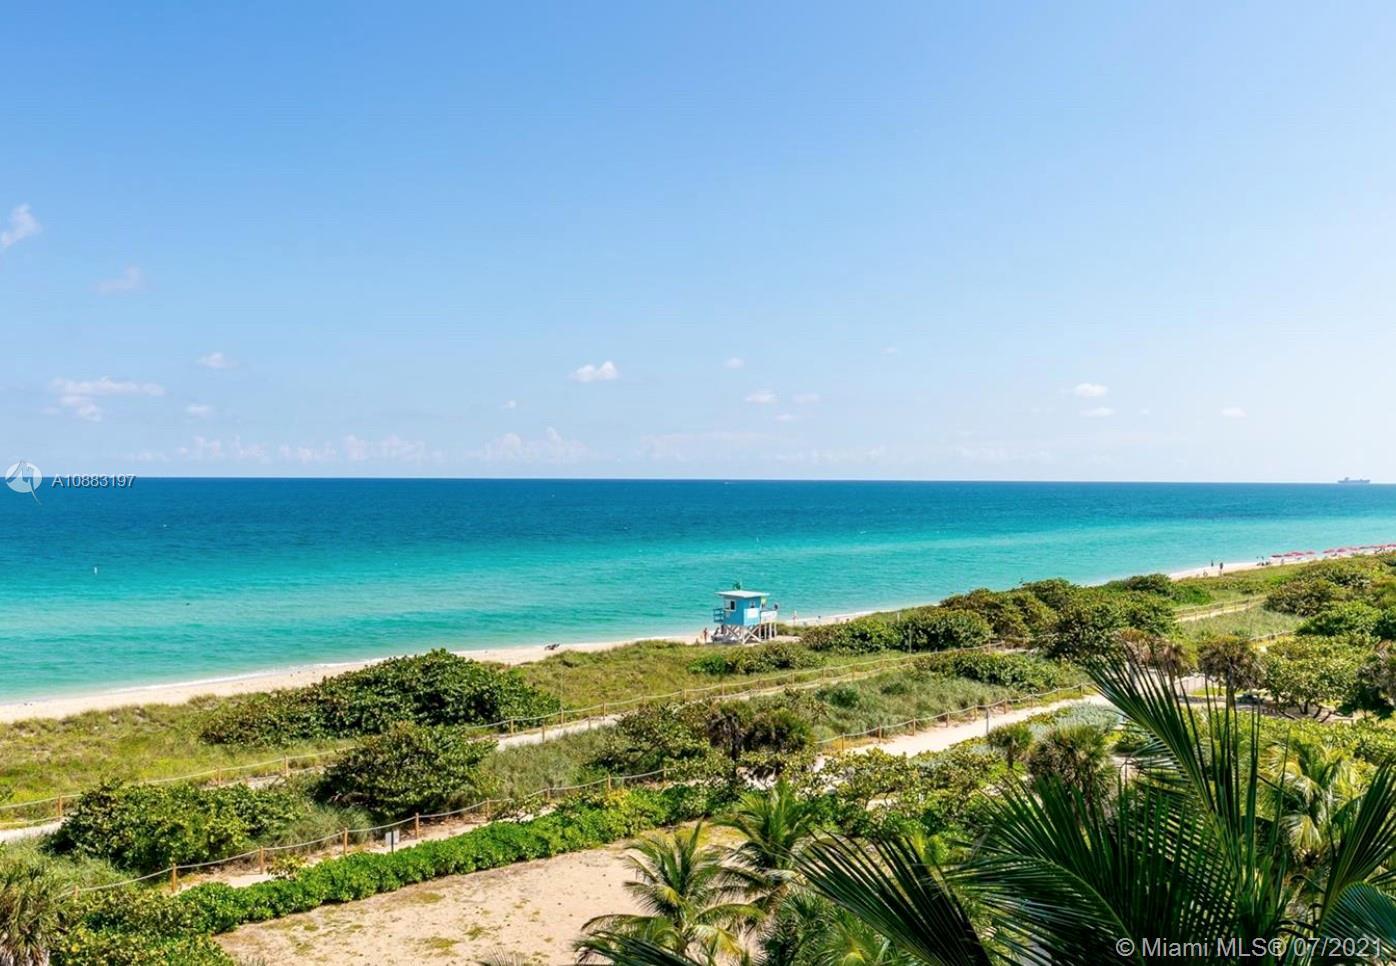 FENDI Chateau Residences, 9349 Collins Ave Unit 506, Surfside, Florida 33154, image 4